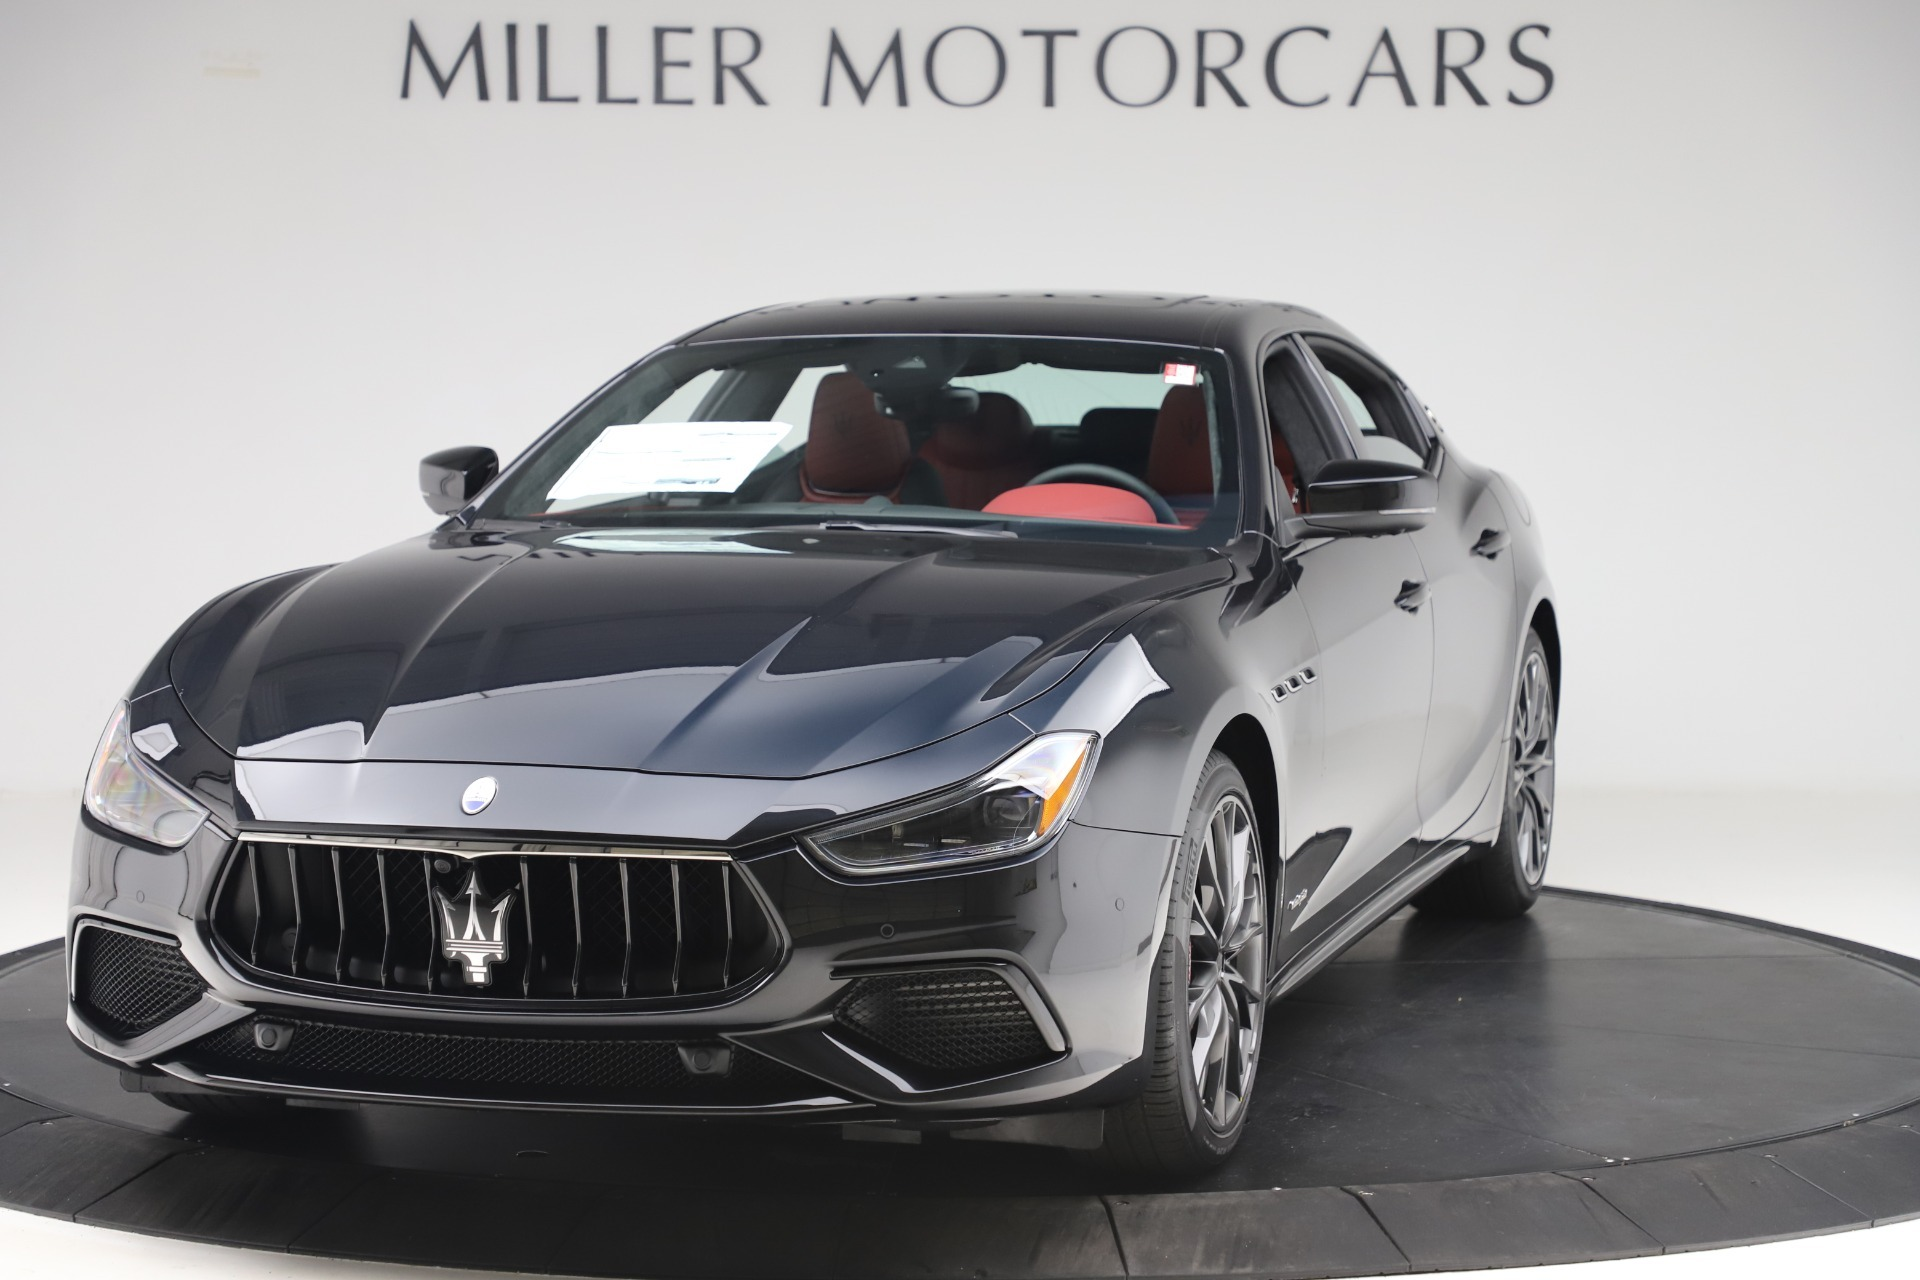 New 2020 Maserati Ghibli S Q4 GranSport for sale $94,785 at Alfa Romeo of Greenwich in Greenwich CT 06830 1